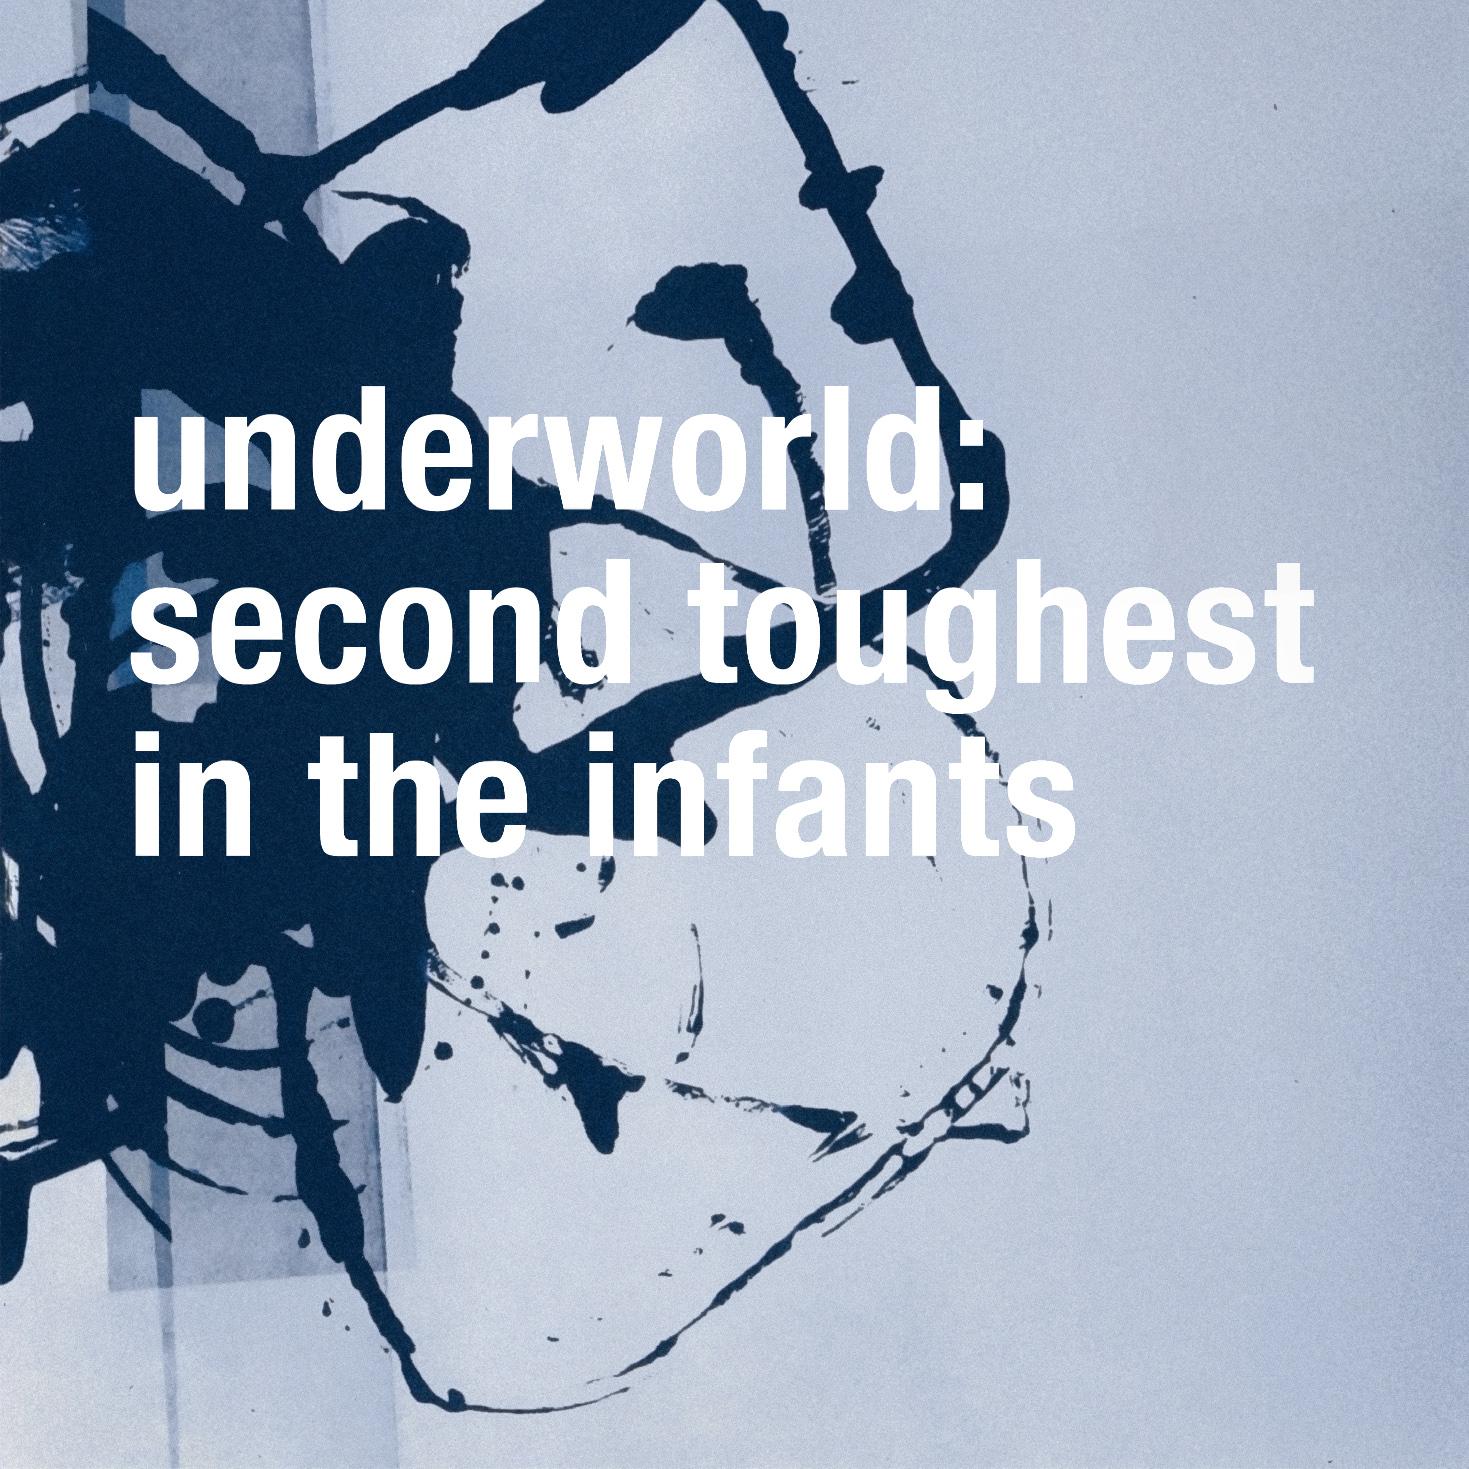 Album Artist: Underworld / Album Title: Second Toughest in the Infants (Remastered)